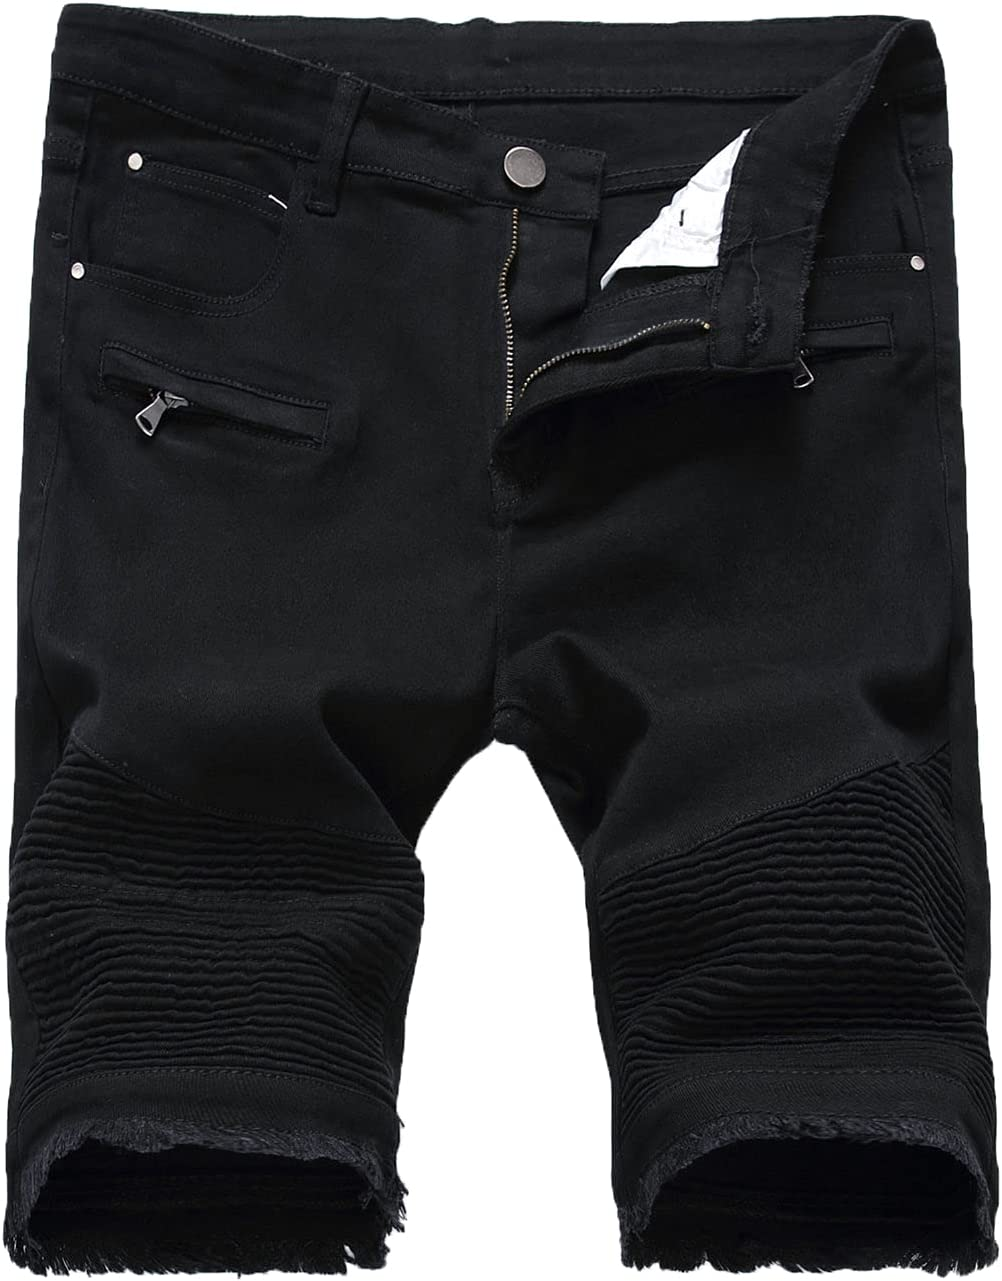 Men's Pleated Denim Shorts Zipper Crumple Ripped Slim Jean Short Distressed Casual Slim Fit Biker Jeans Shorts (Black1,30)